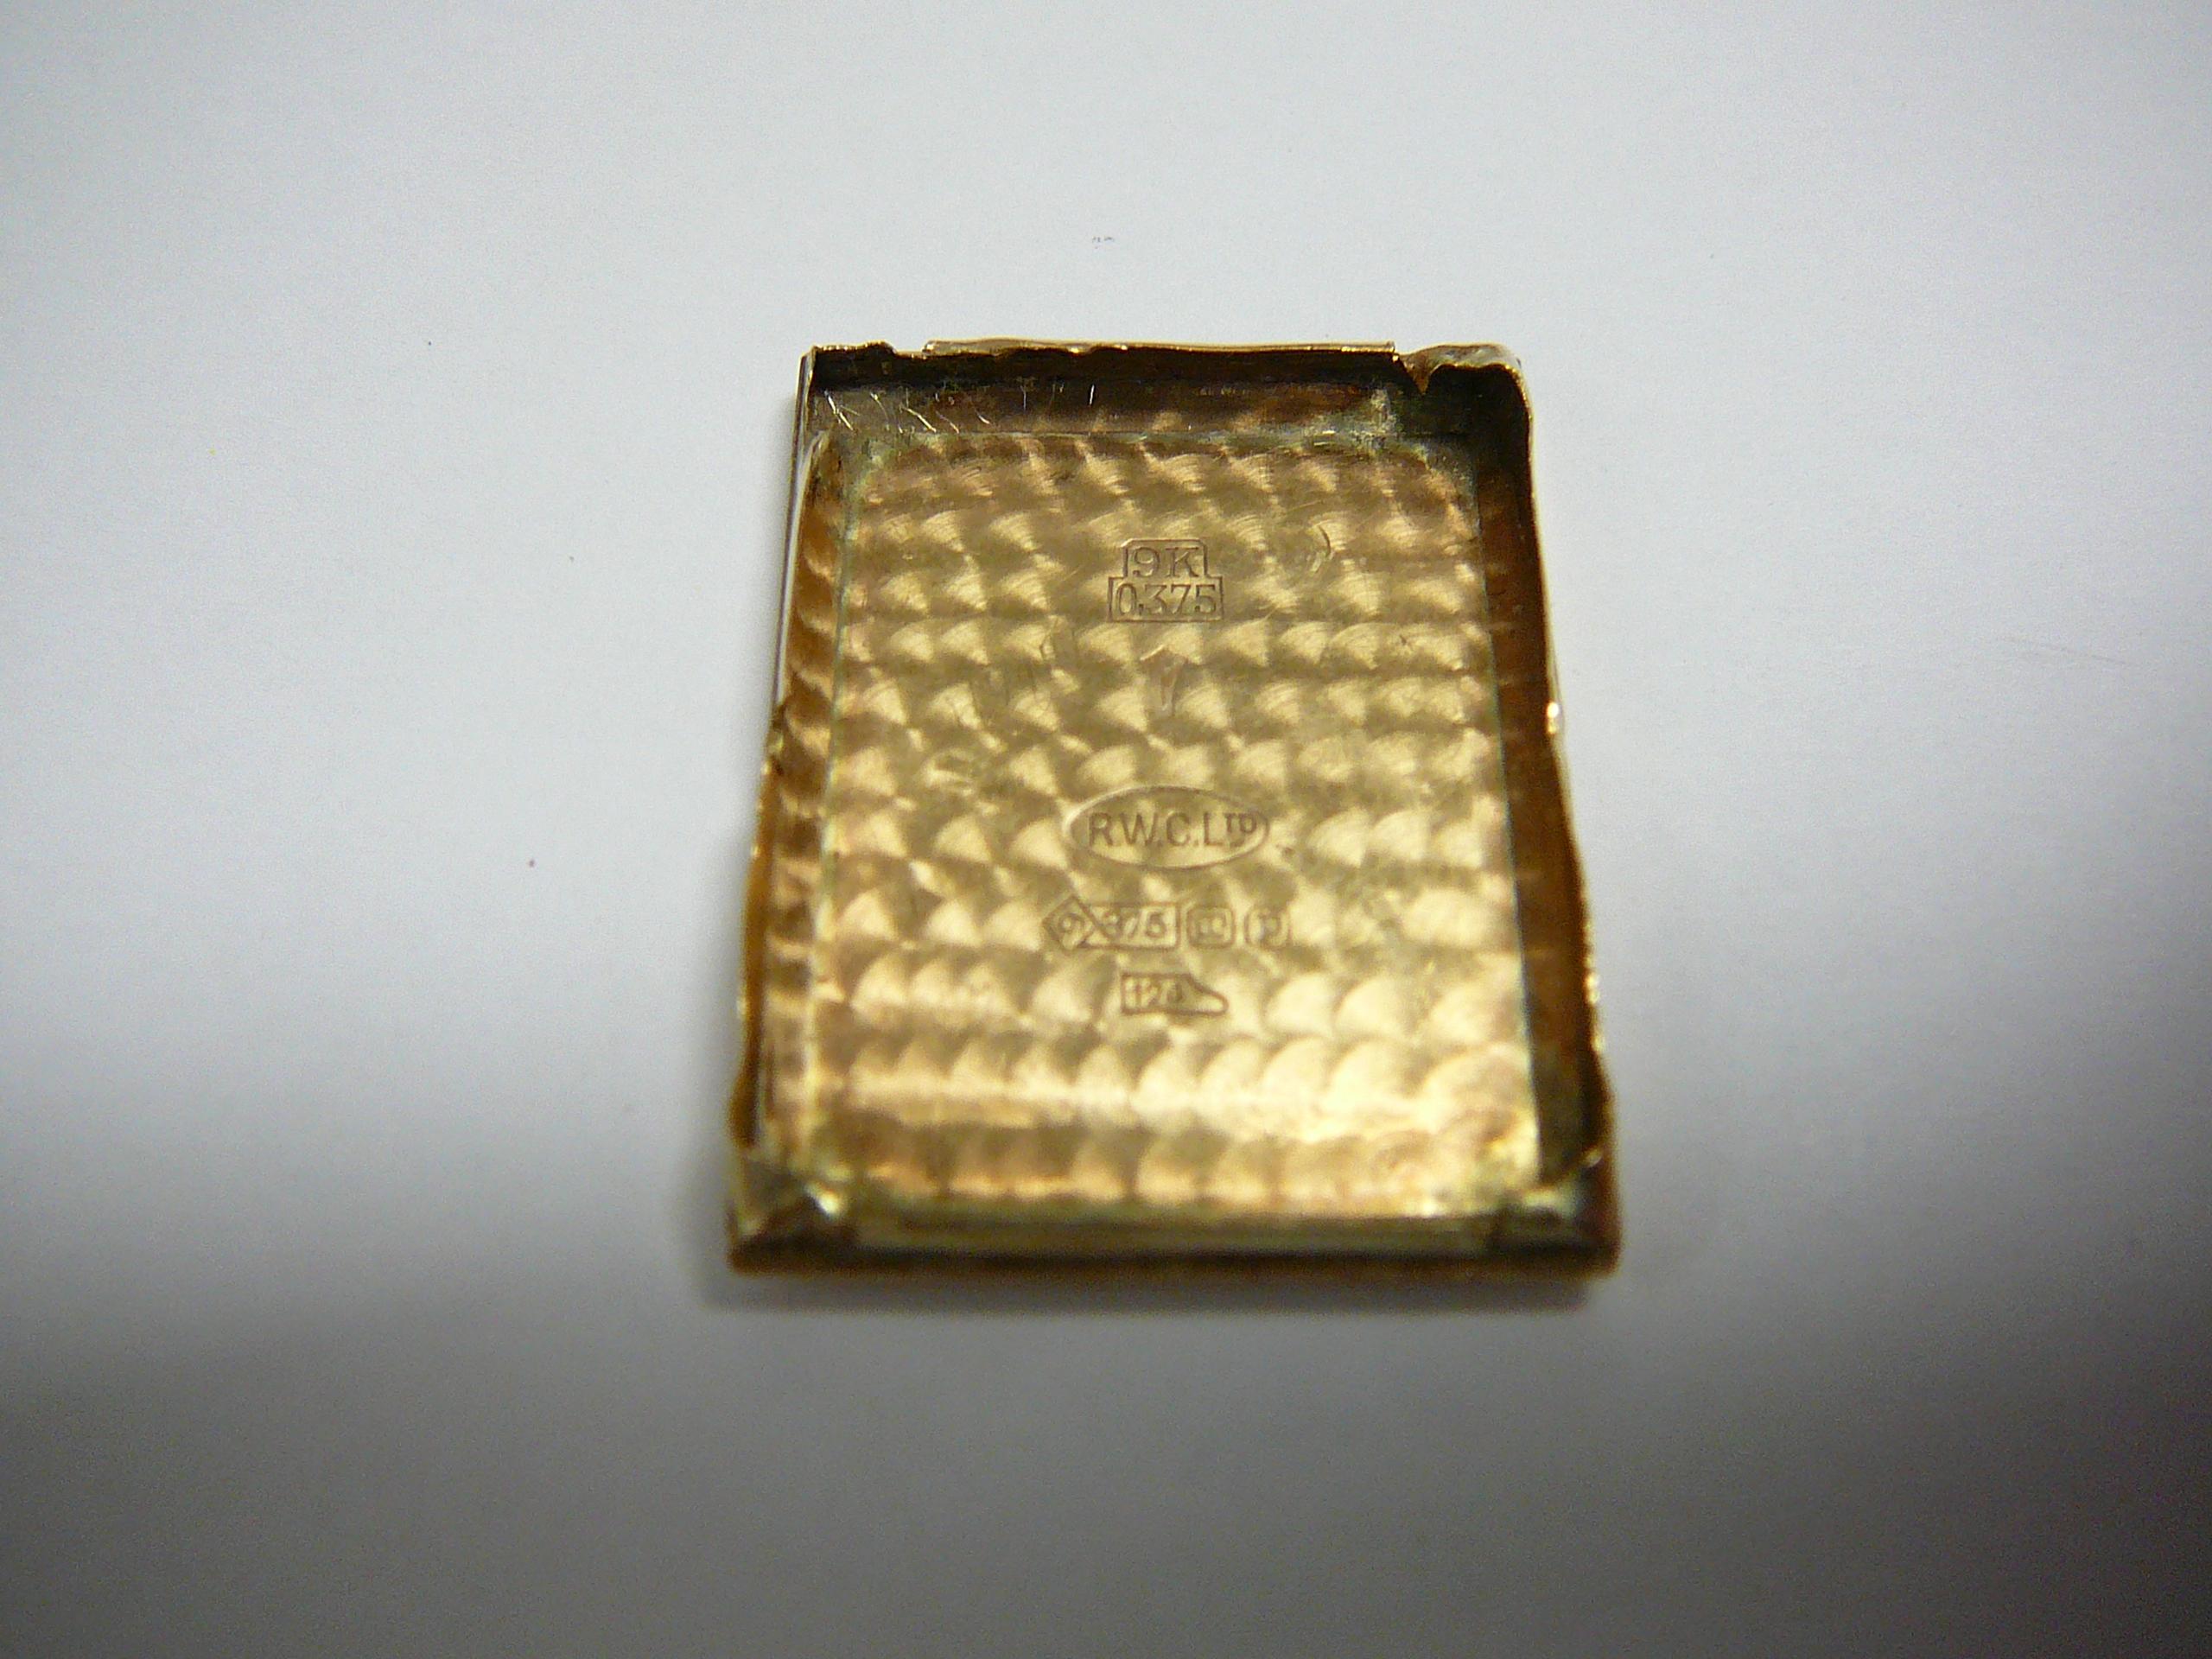 Lot 20 - Gents vintage gold Rolex wrist watch